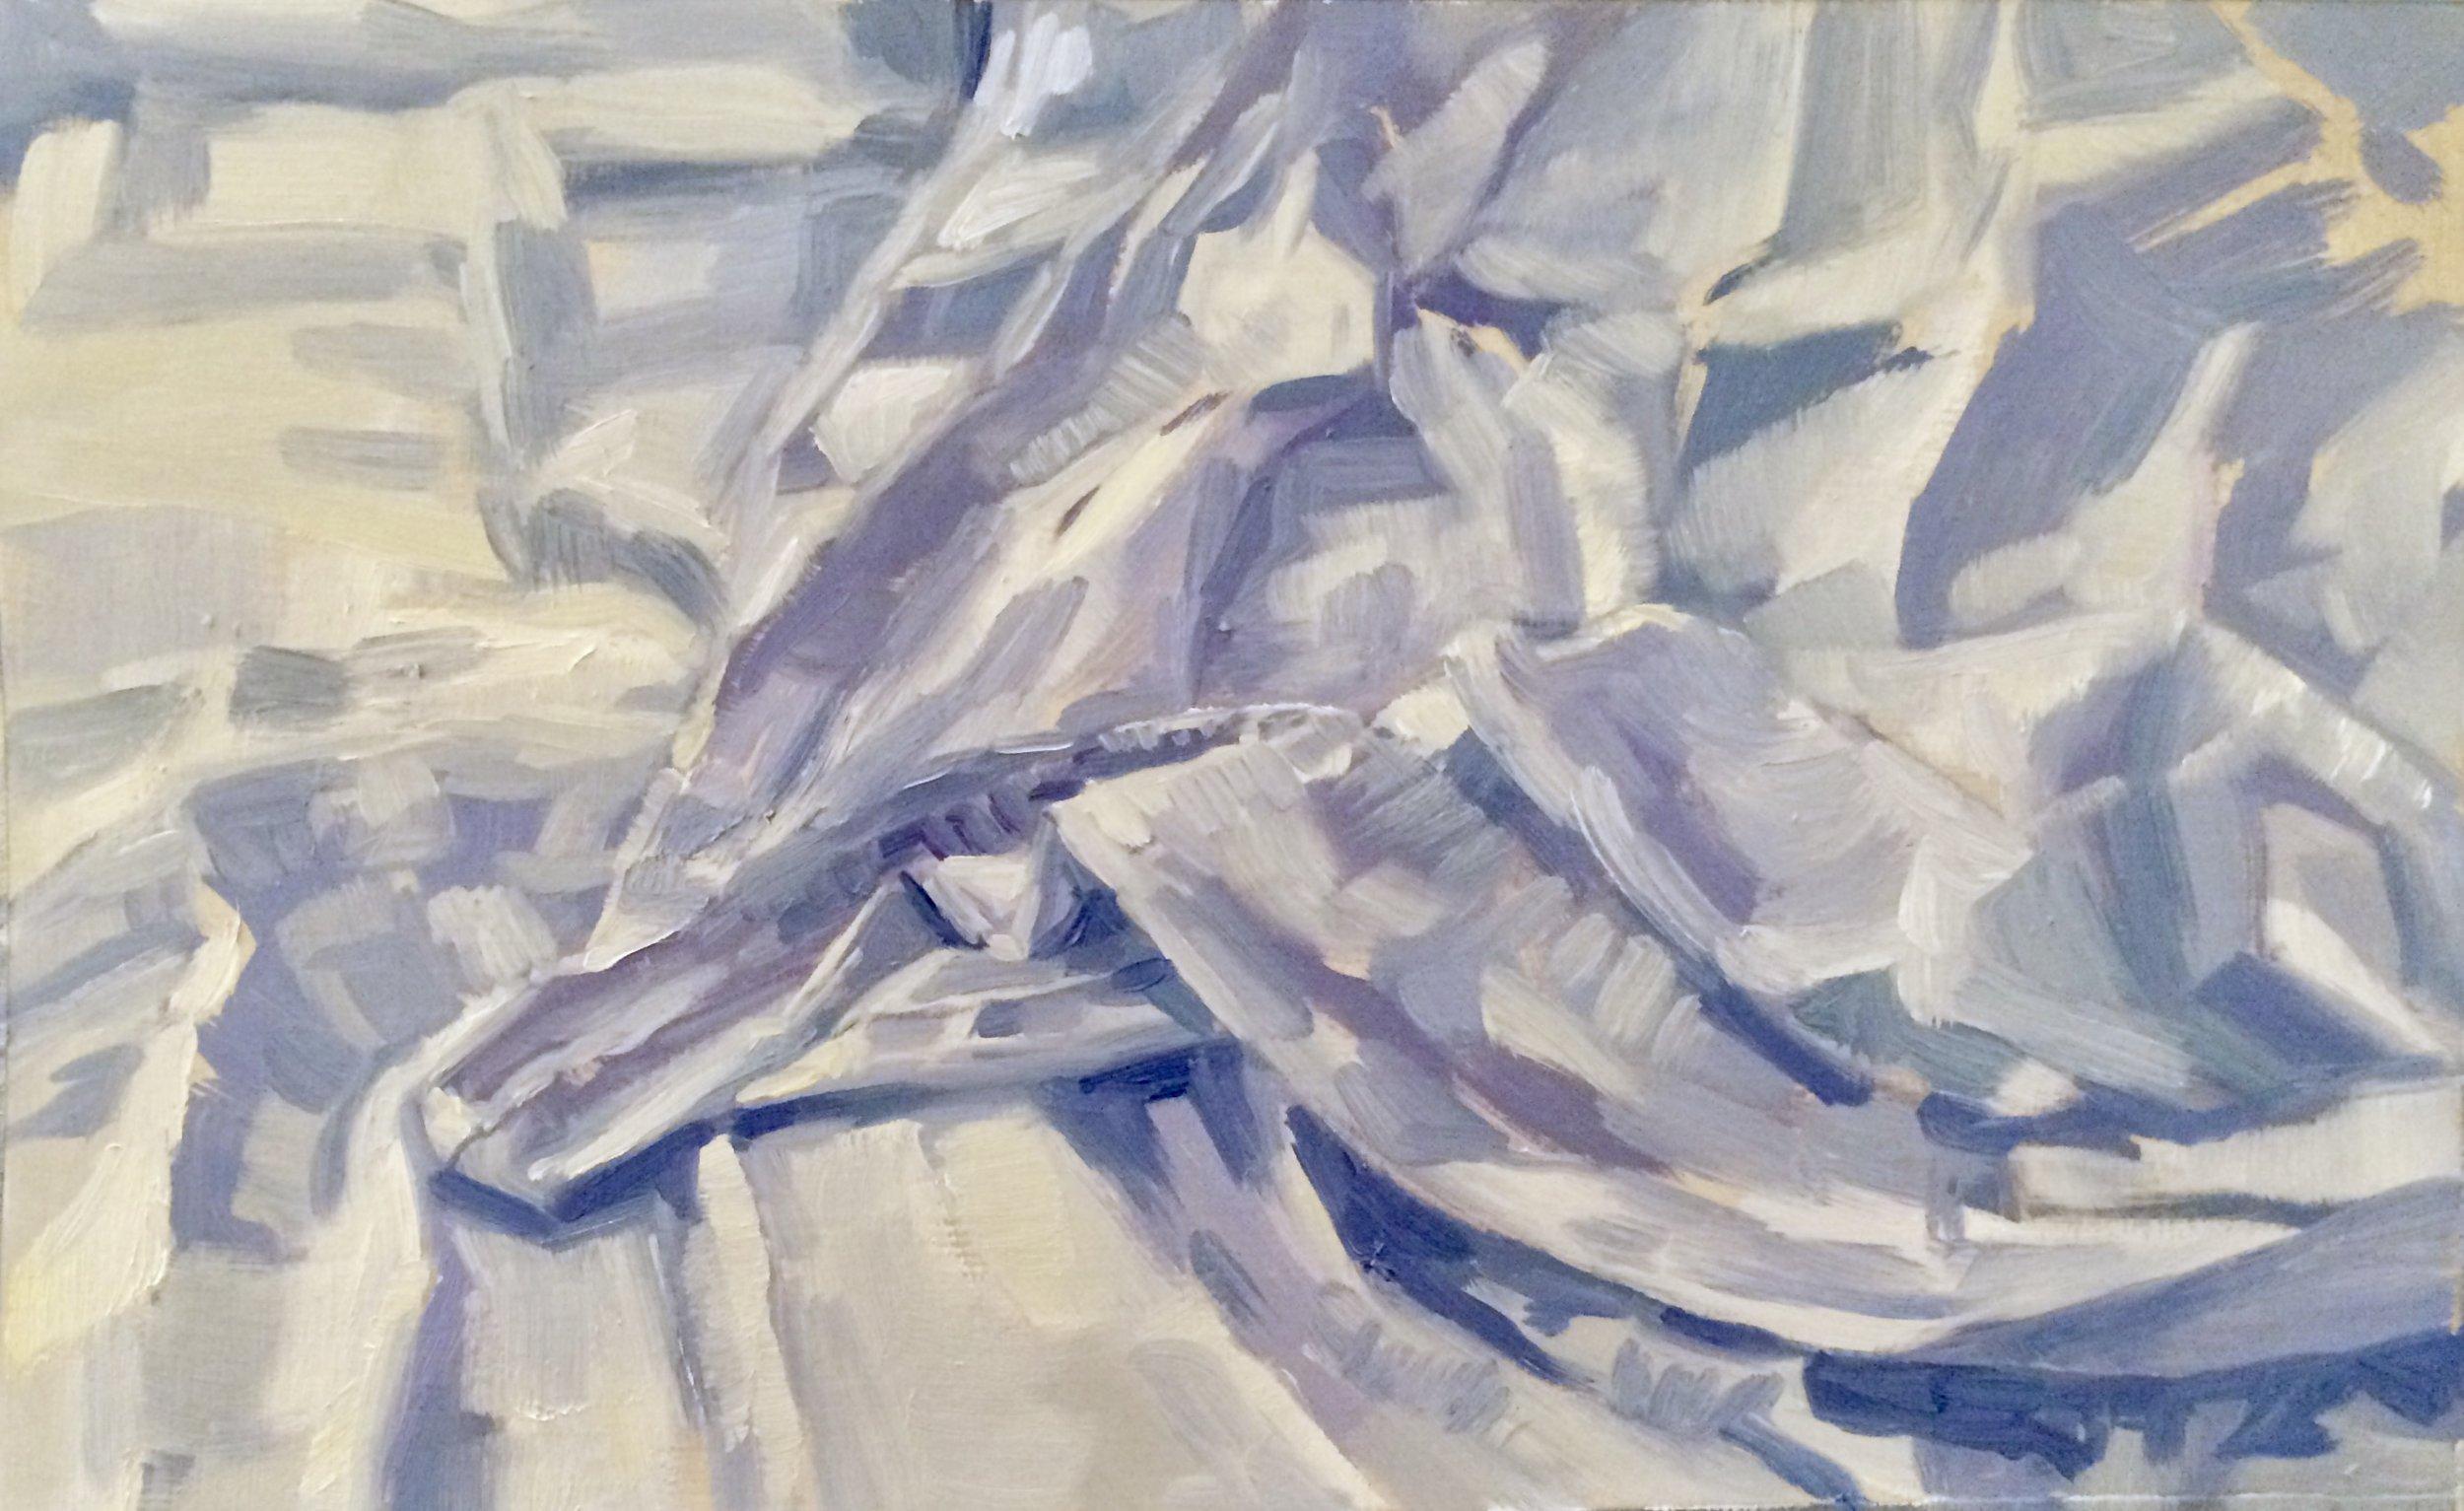 Lavender Sheets,   2017  Oil on Paper